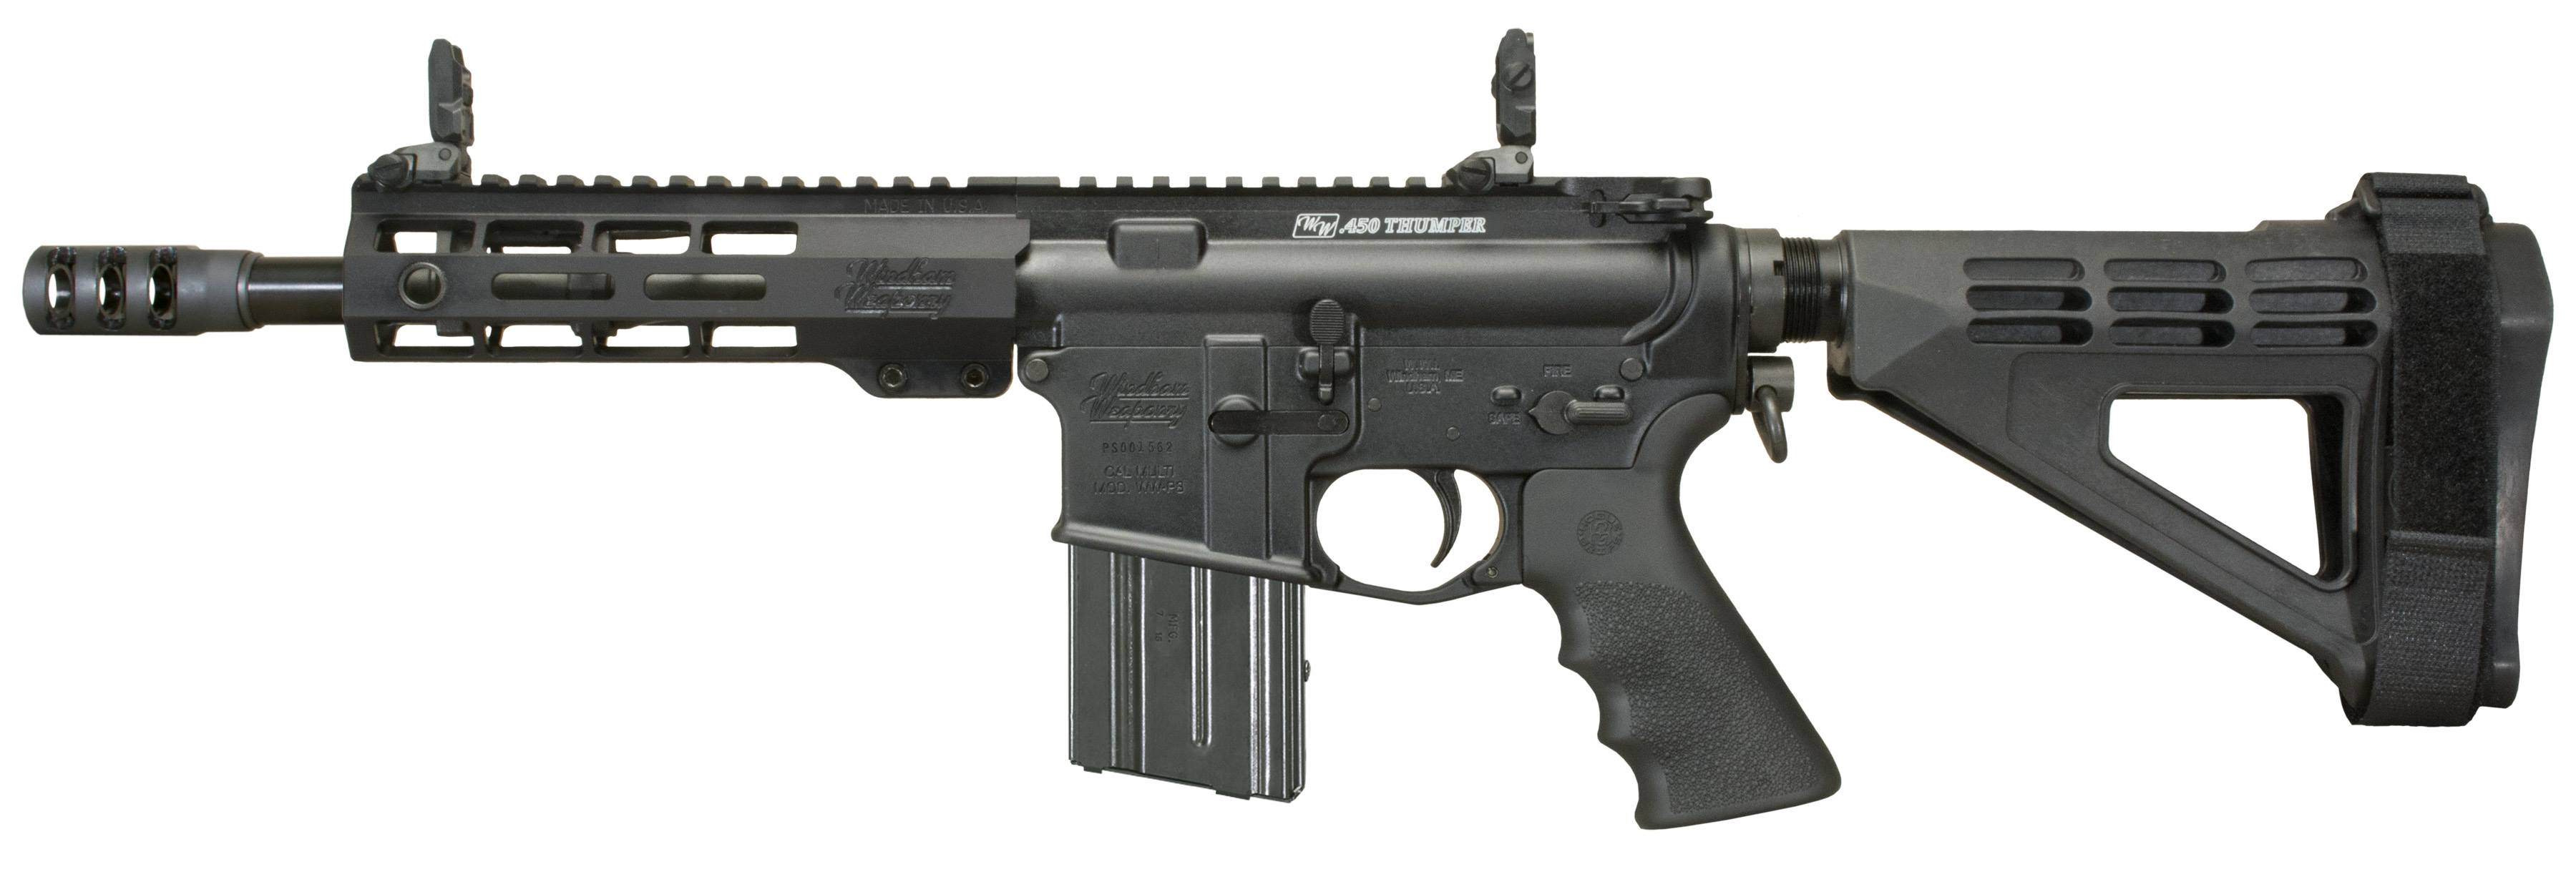 Windham Weaponry RP9SFS-450M PISTOL 450 BUSHMASTER